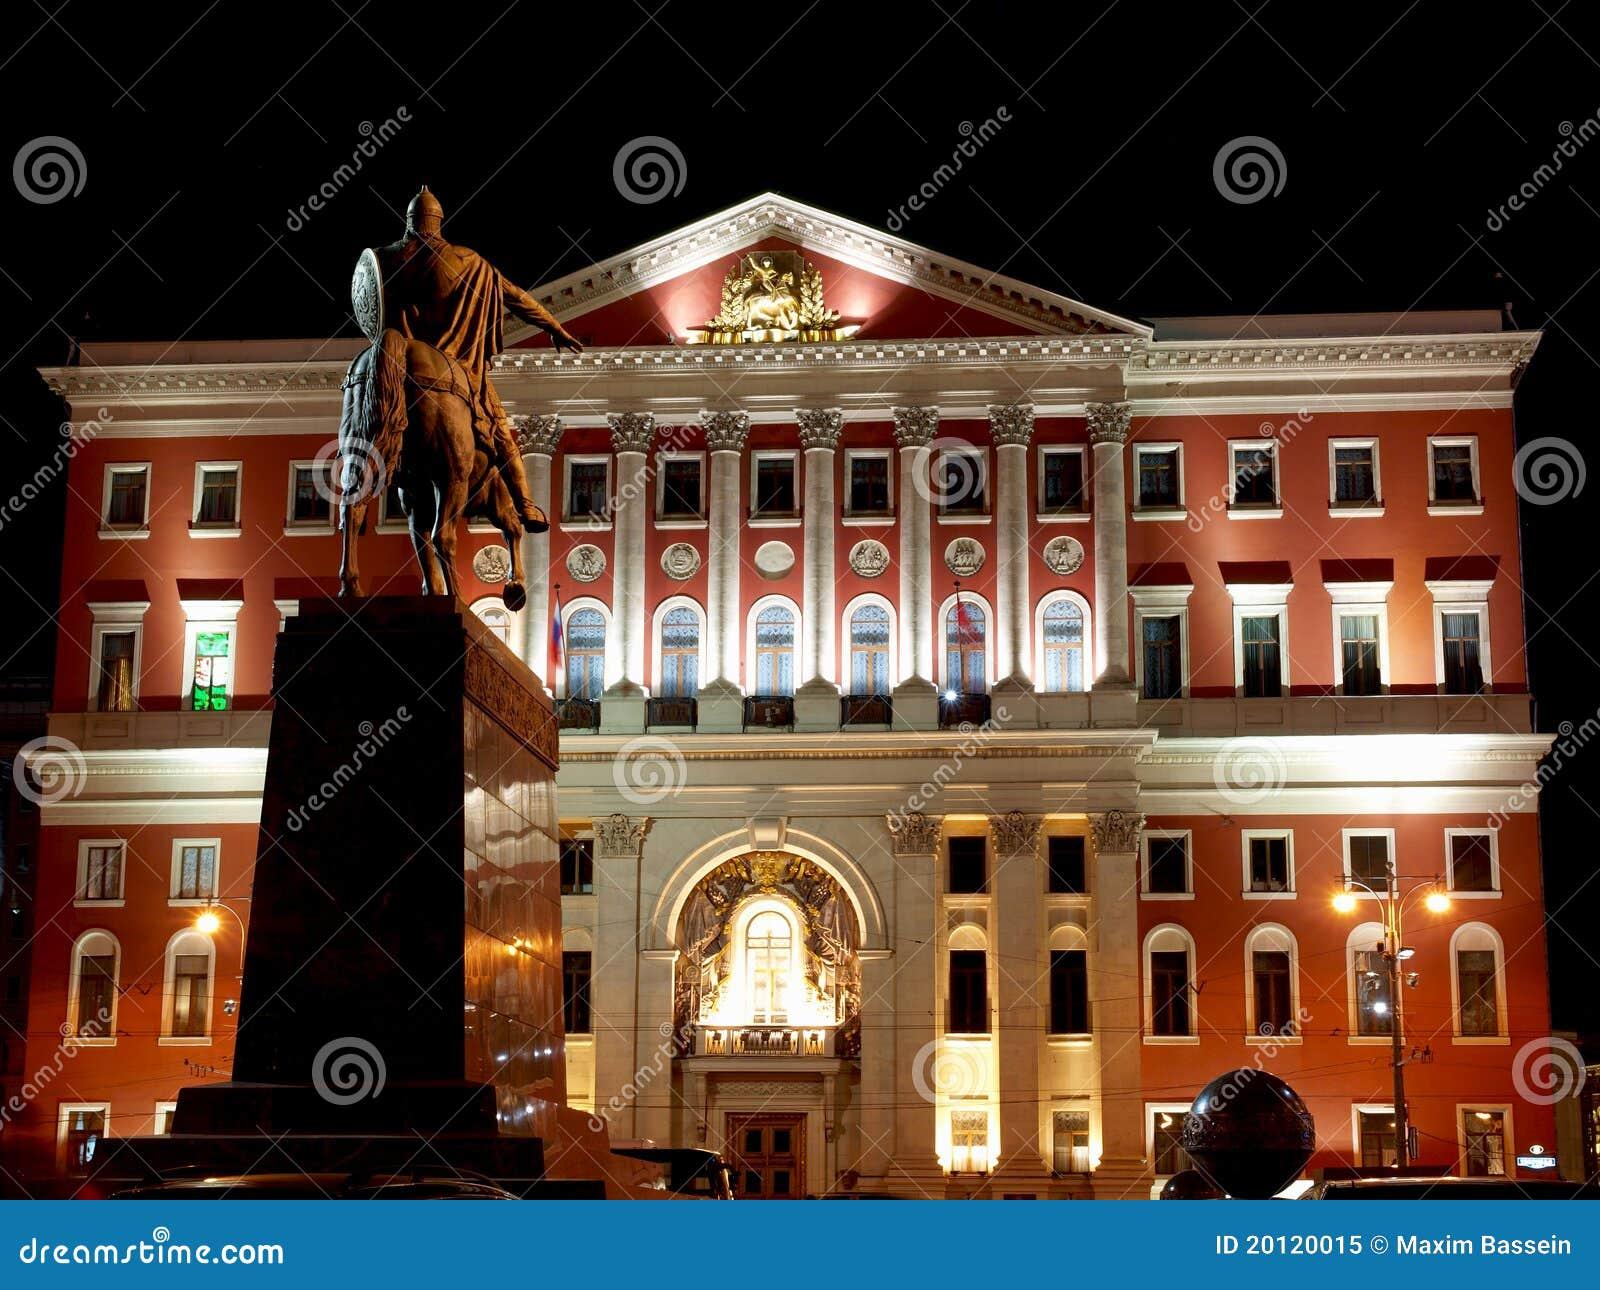 Un monumento al fundador de Moscú